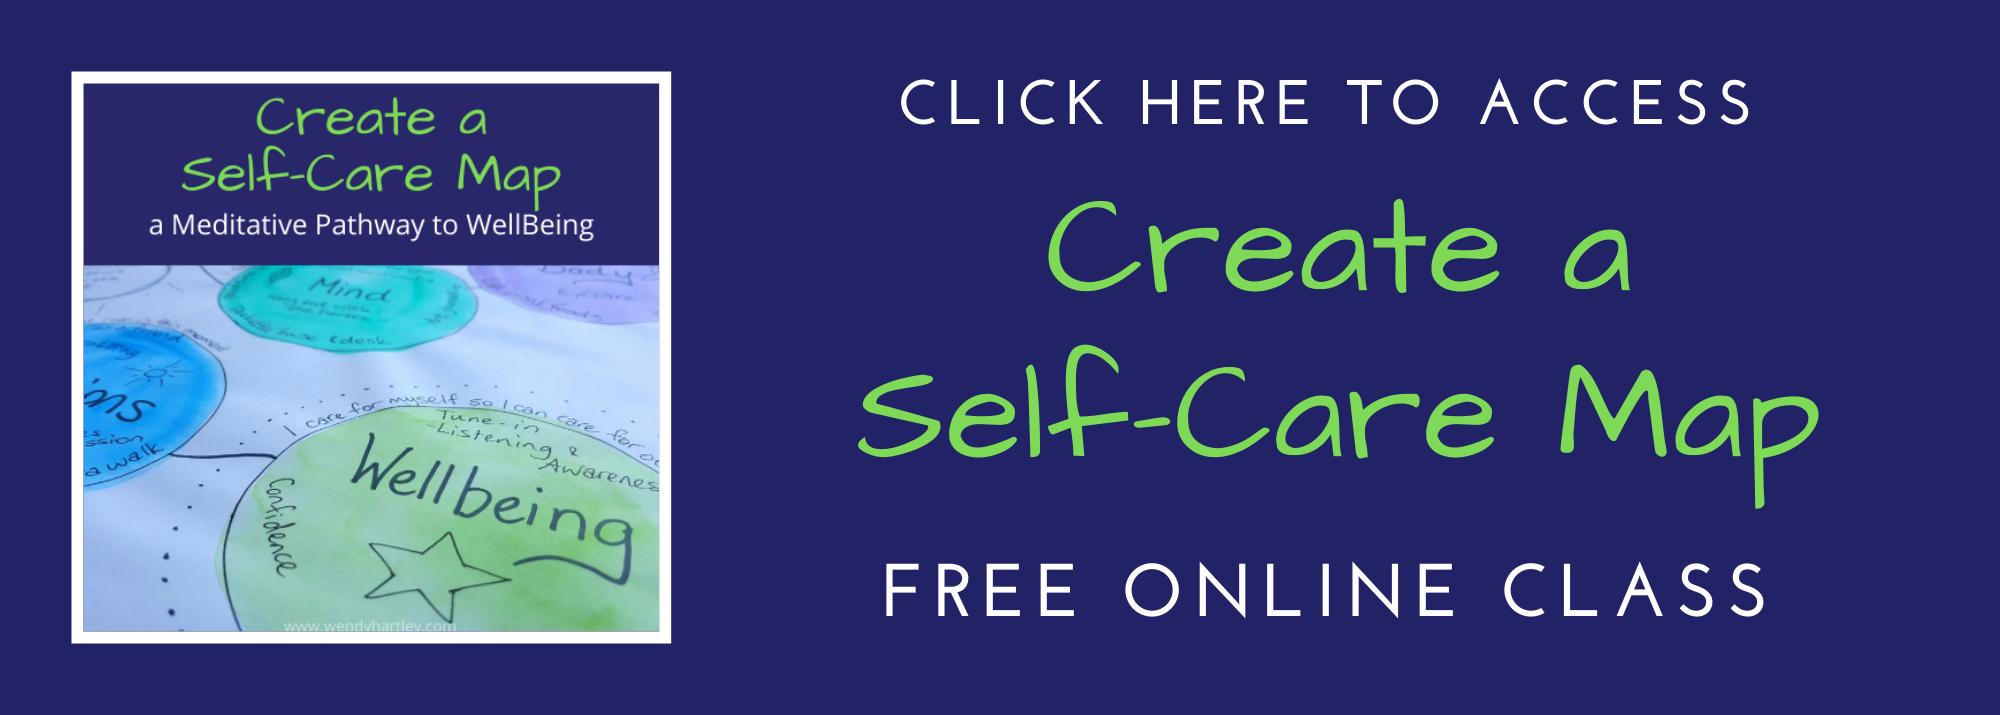 healing art class reiki painting wellbeing health